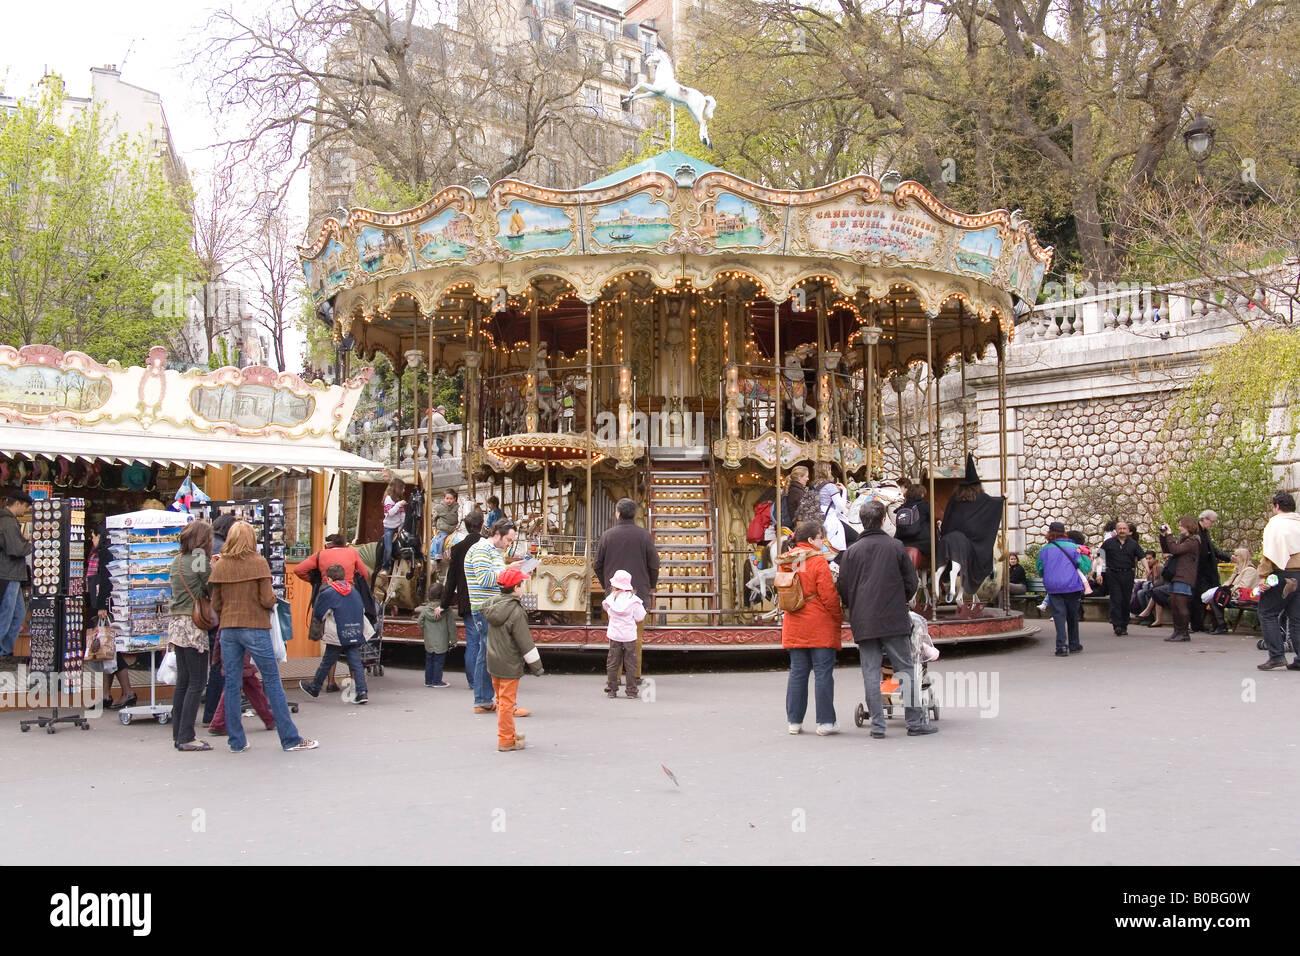 Funfair at Sacre Coer church at Montmartre in Paris France - Stock Image